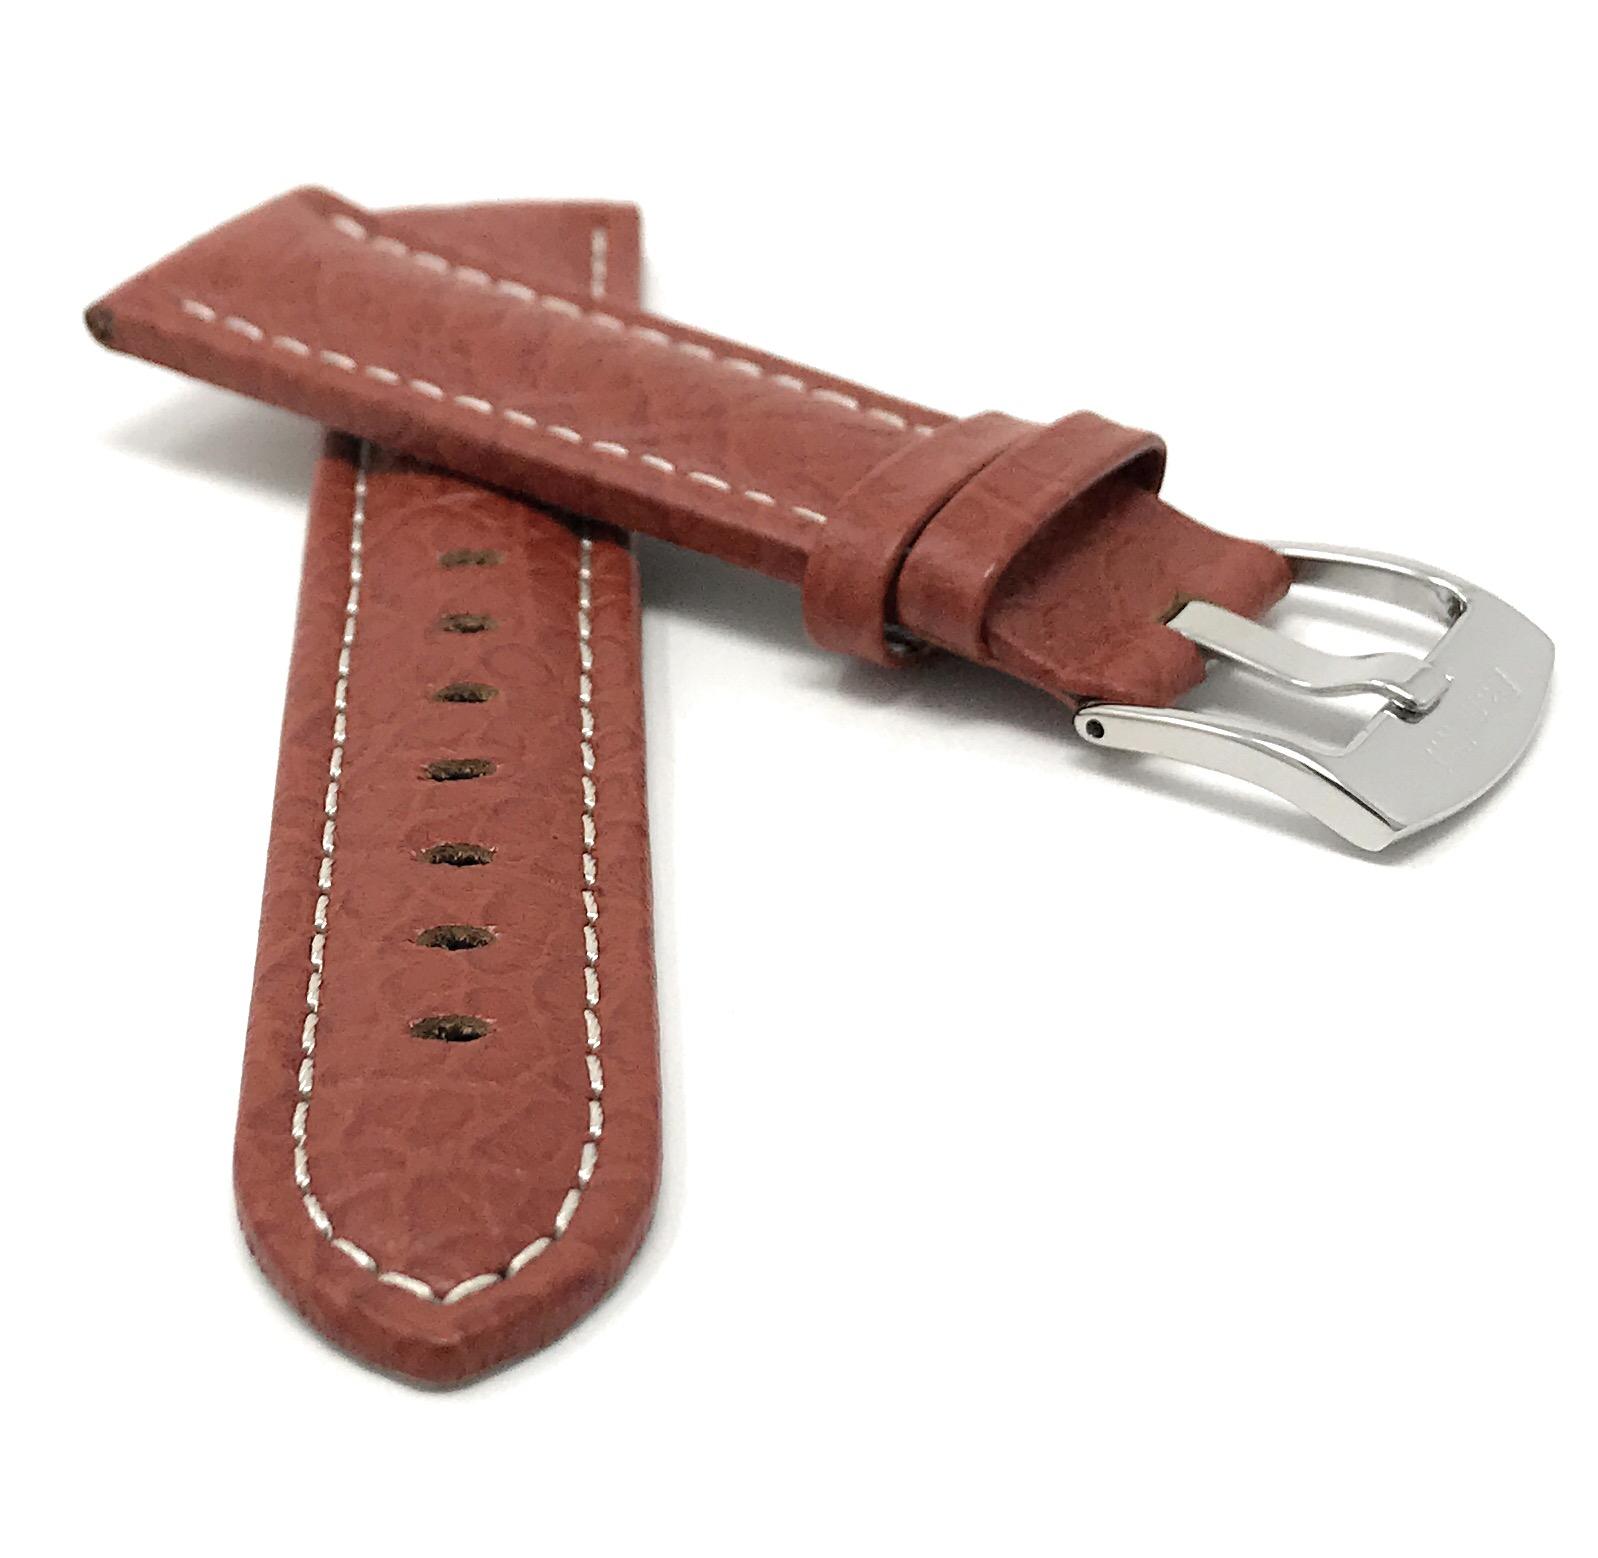 Bandini-Watch-Band-Leather-Strap-Buffalo-Pattern-18mm-30mm-Extra-Long-Also thumbnail 22